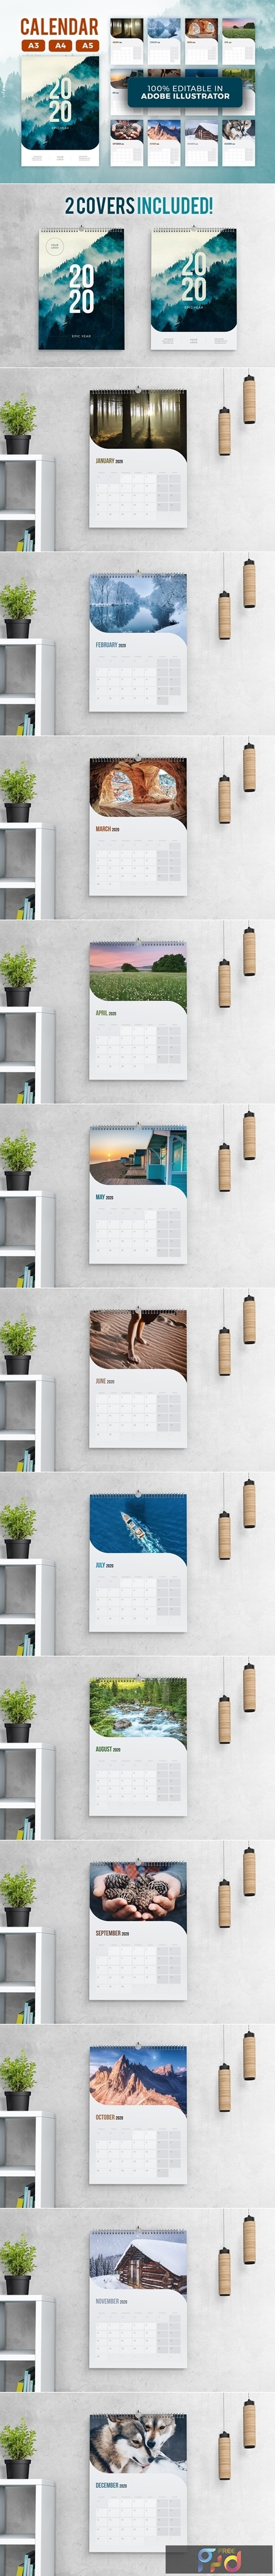 2020 Calendar Template 4401115 1